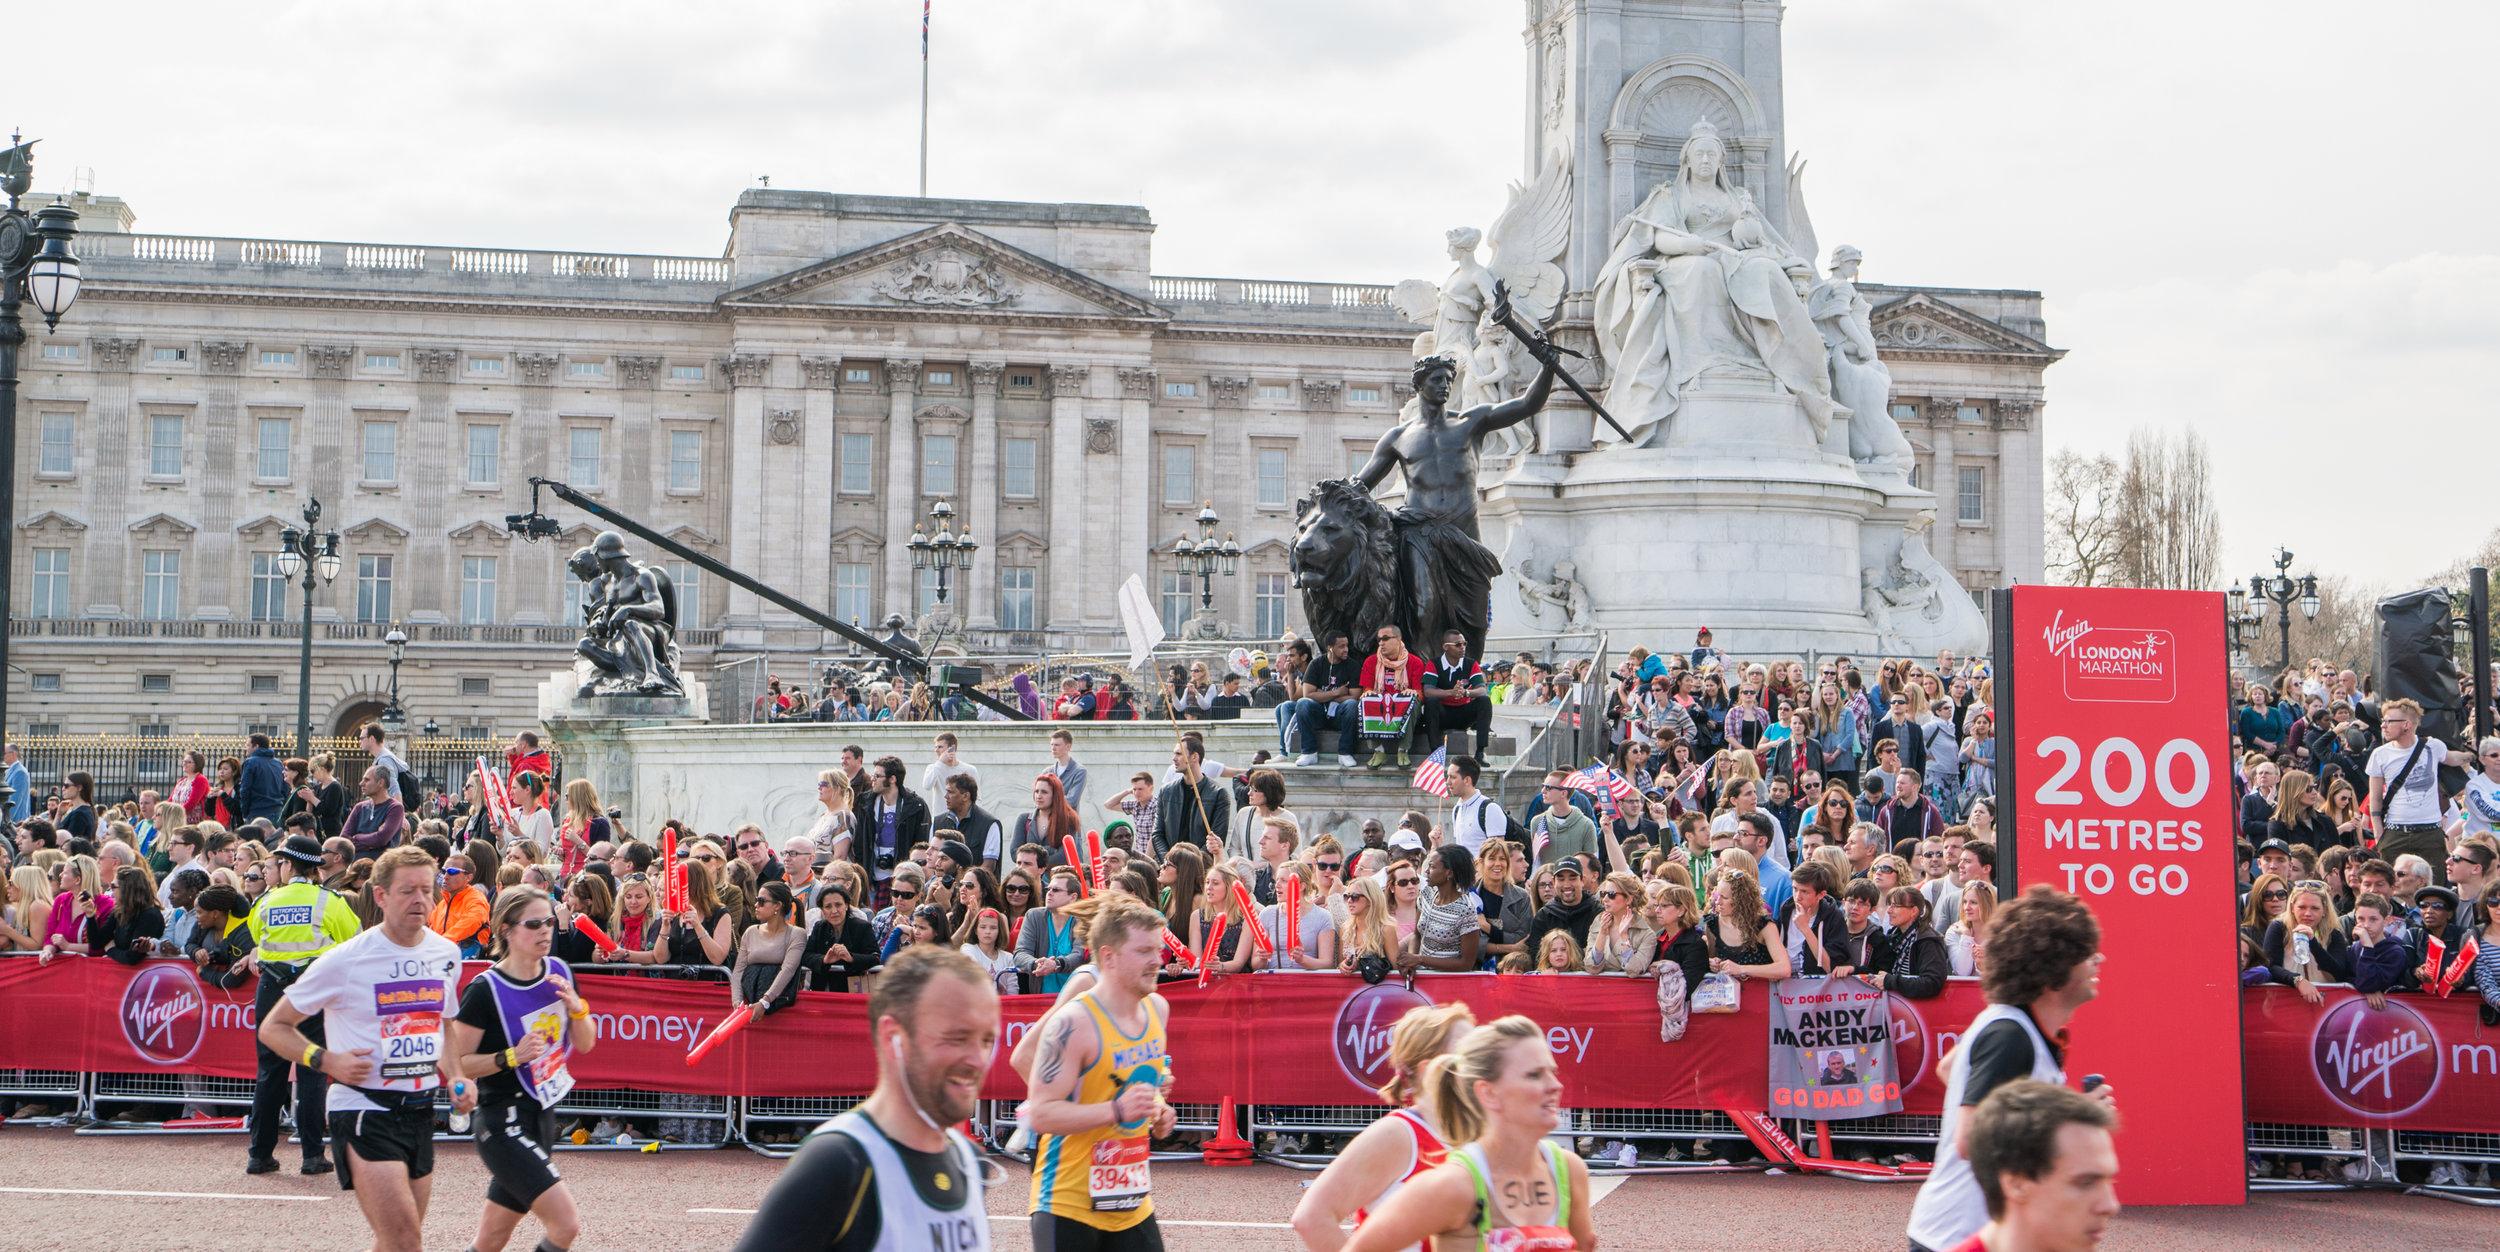 London Marathon_APCG4.JPG